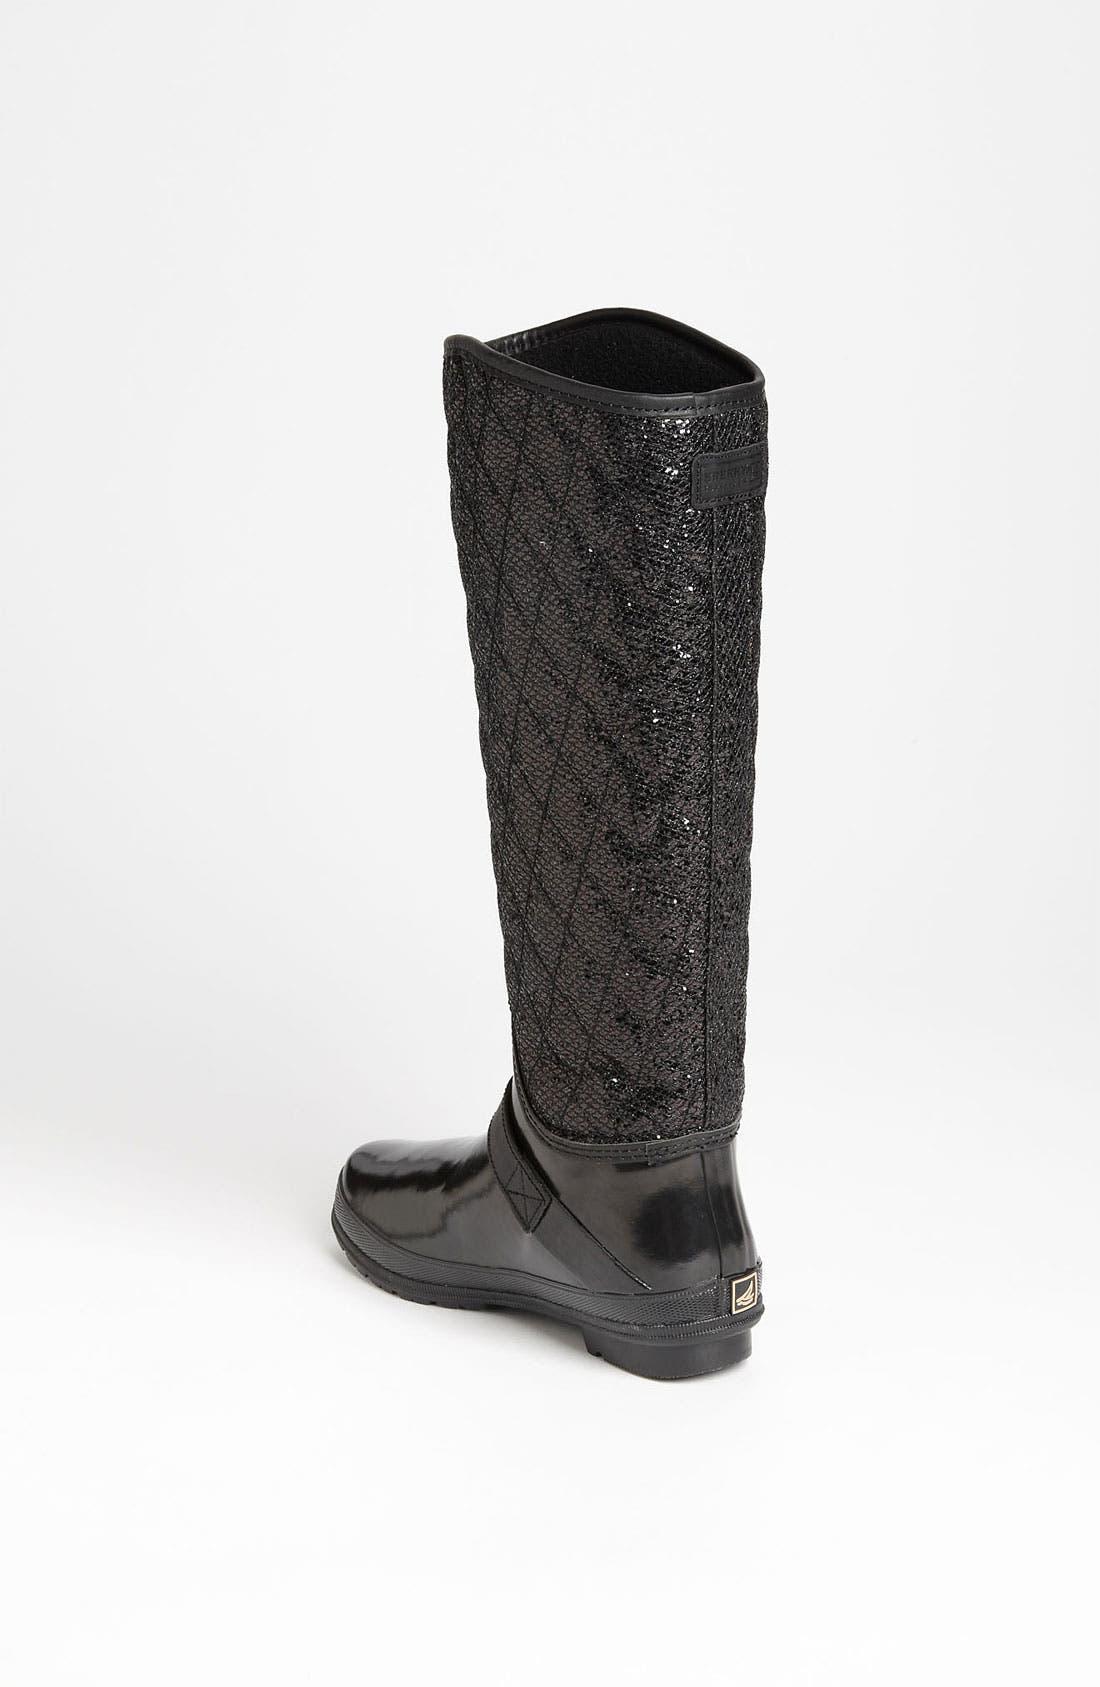 Alternate Image 2  - Sperry Top-Sider® 'Hingham' Rain Boot (Women)